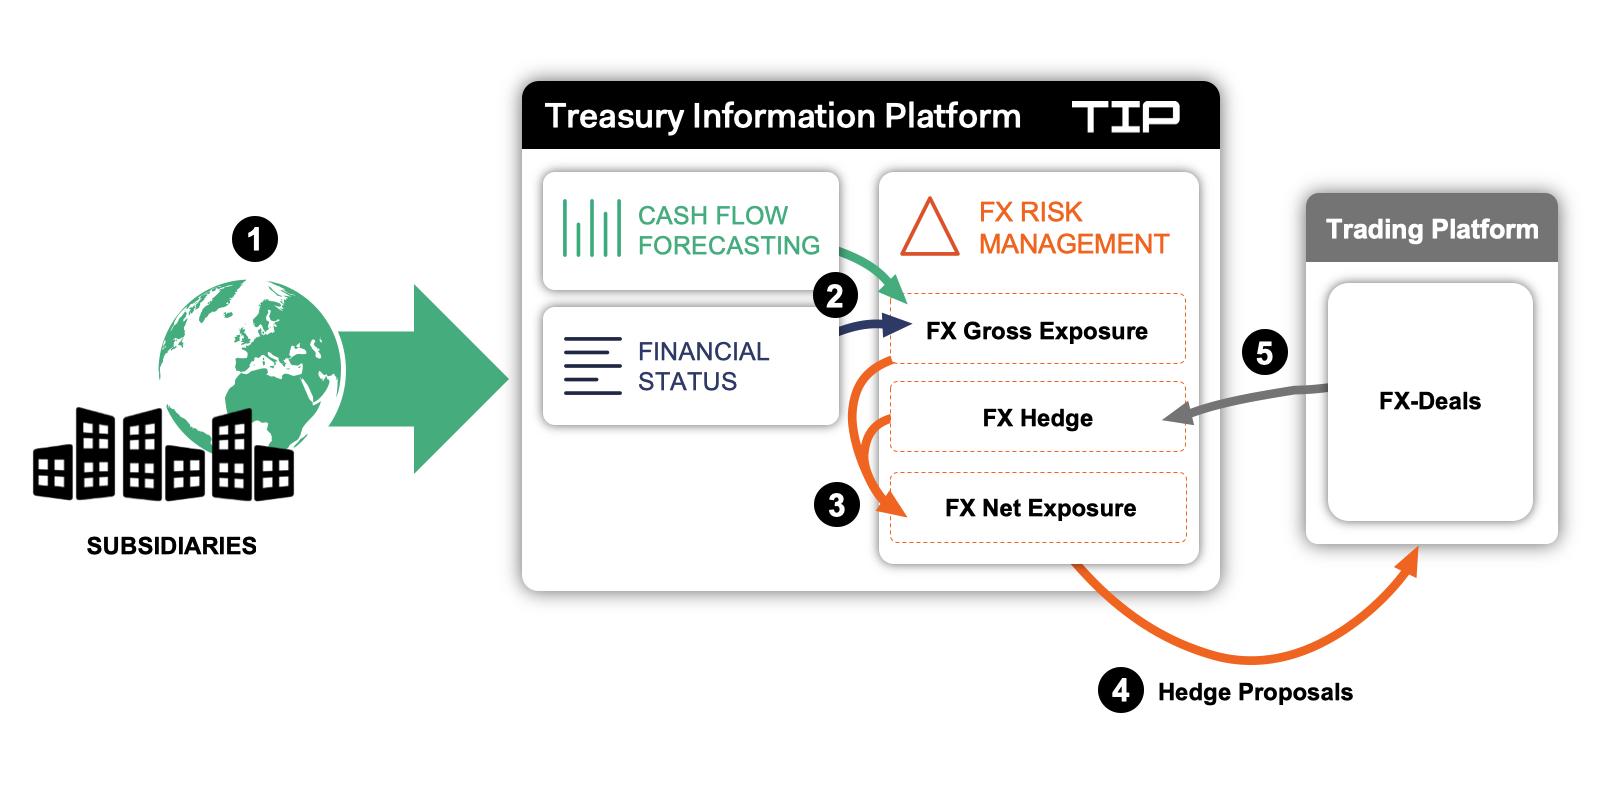 FX Risk Management with TIP